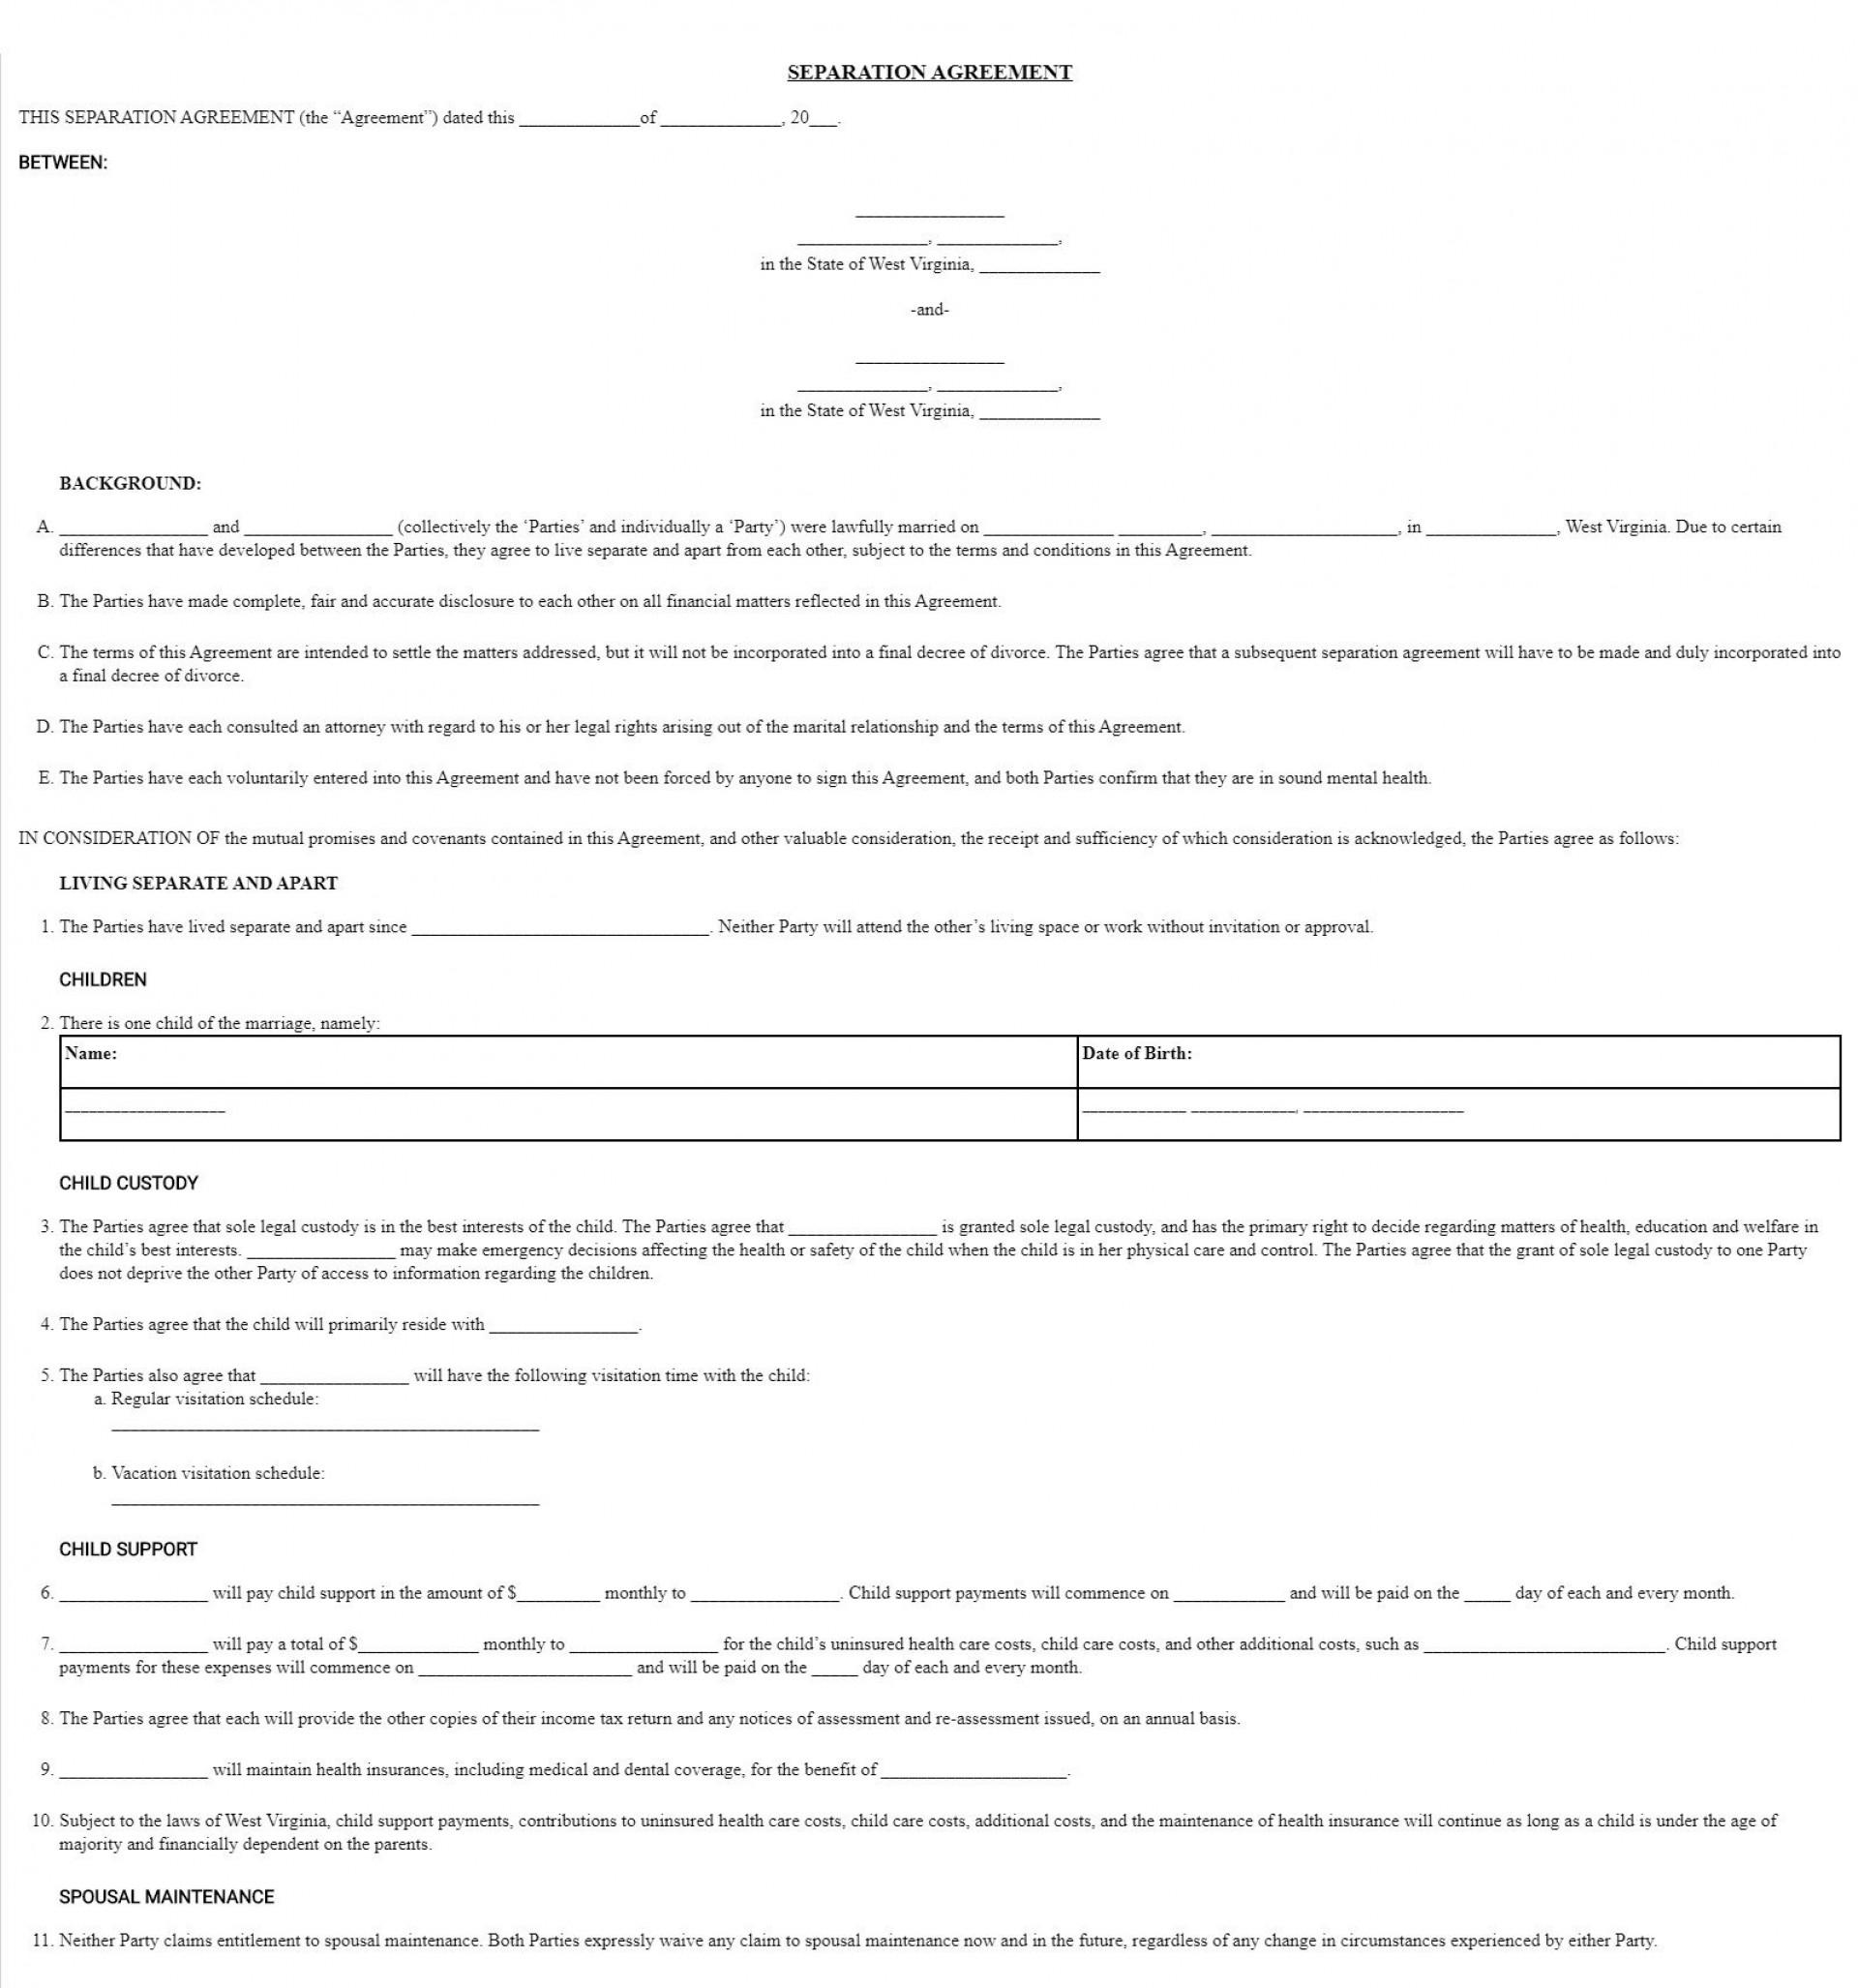 003 Wondrou Virginia Separation Agreement Template Highest Clarity  Marital Marriage1920